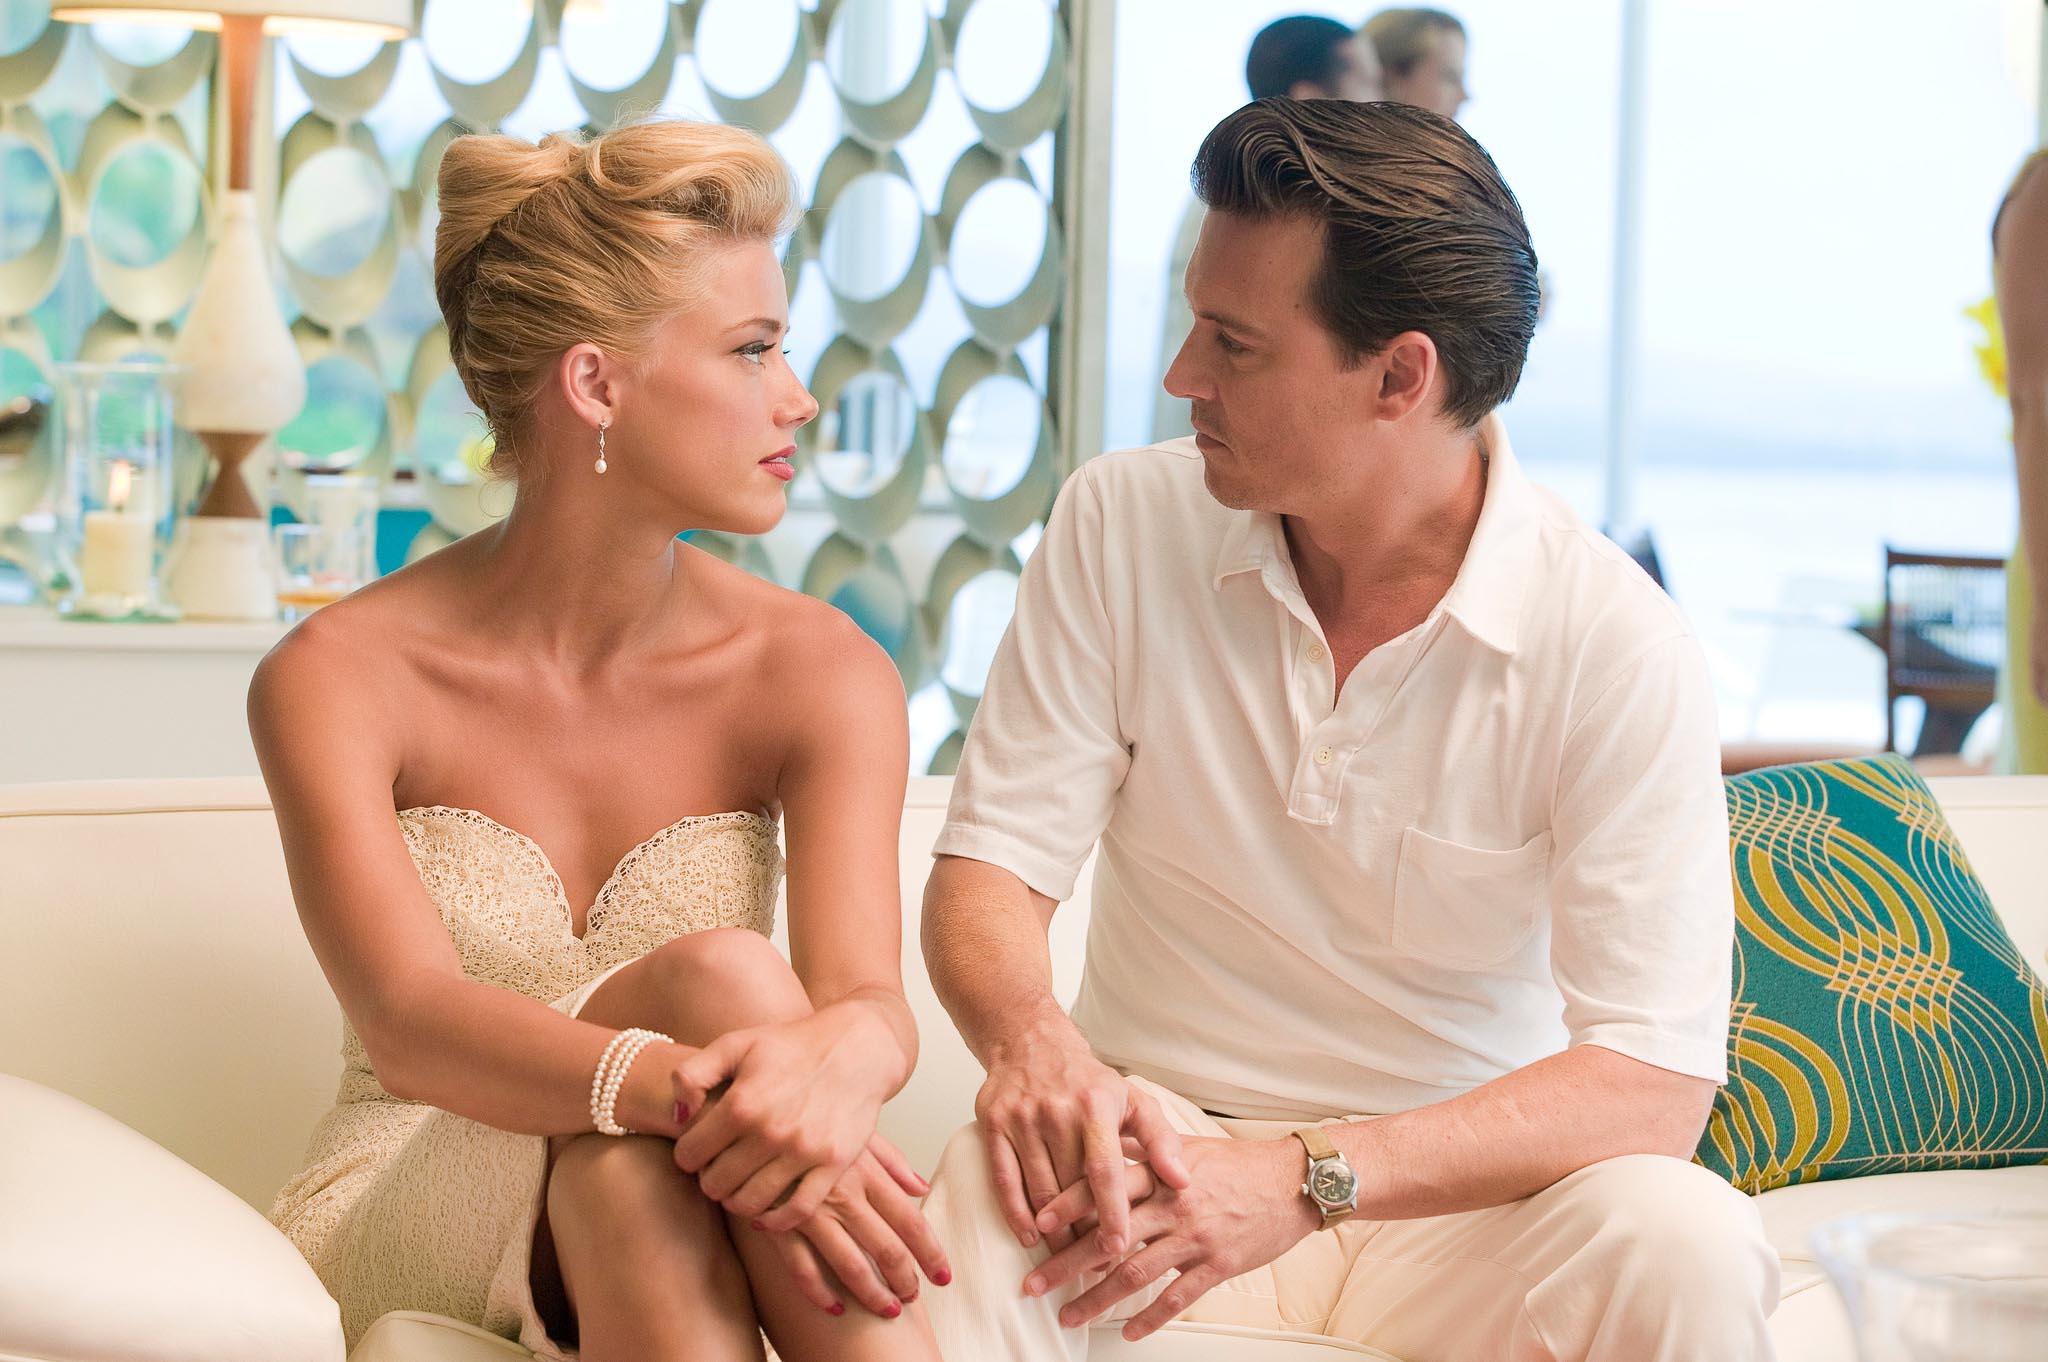 Film interpretati da Amber Heard